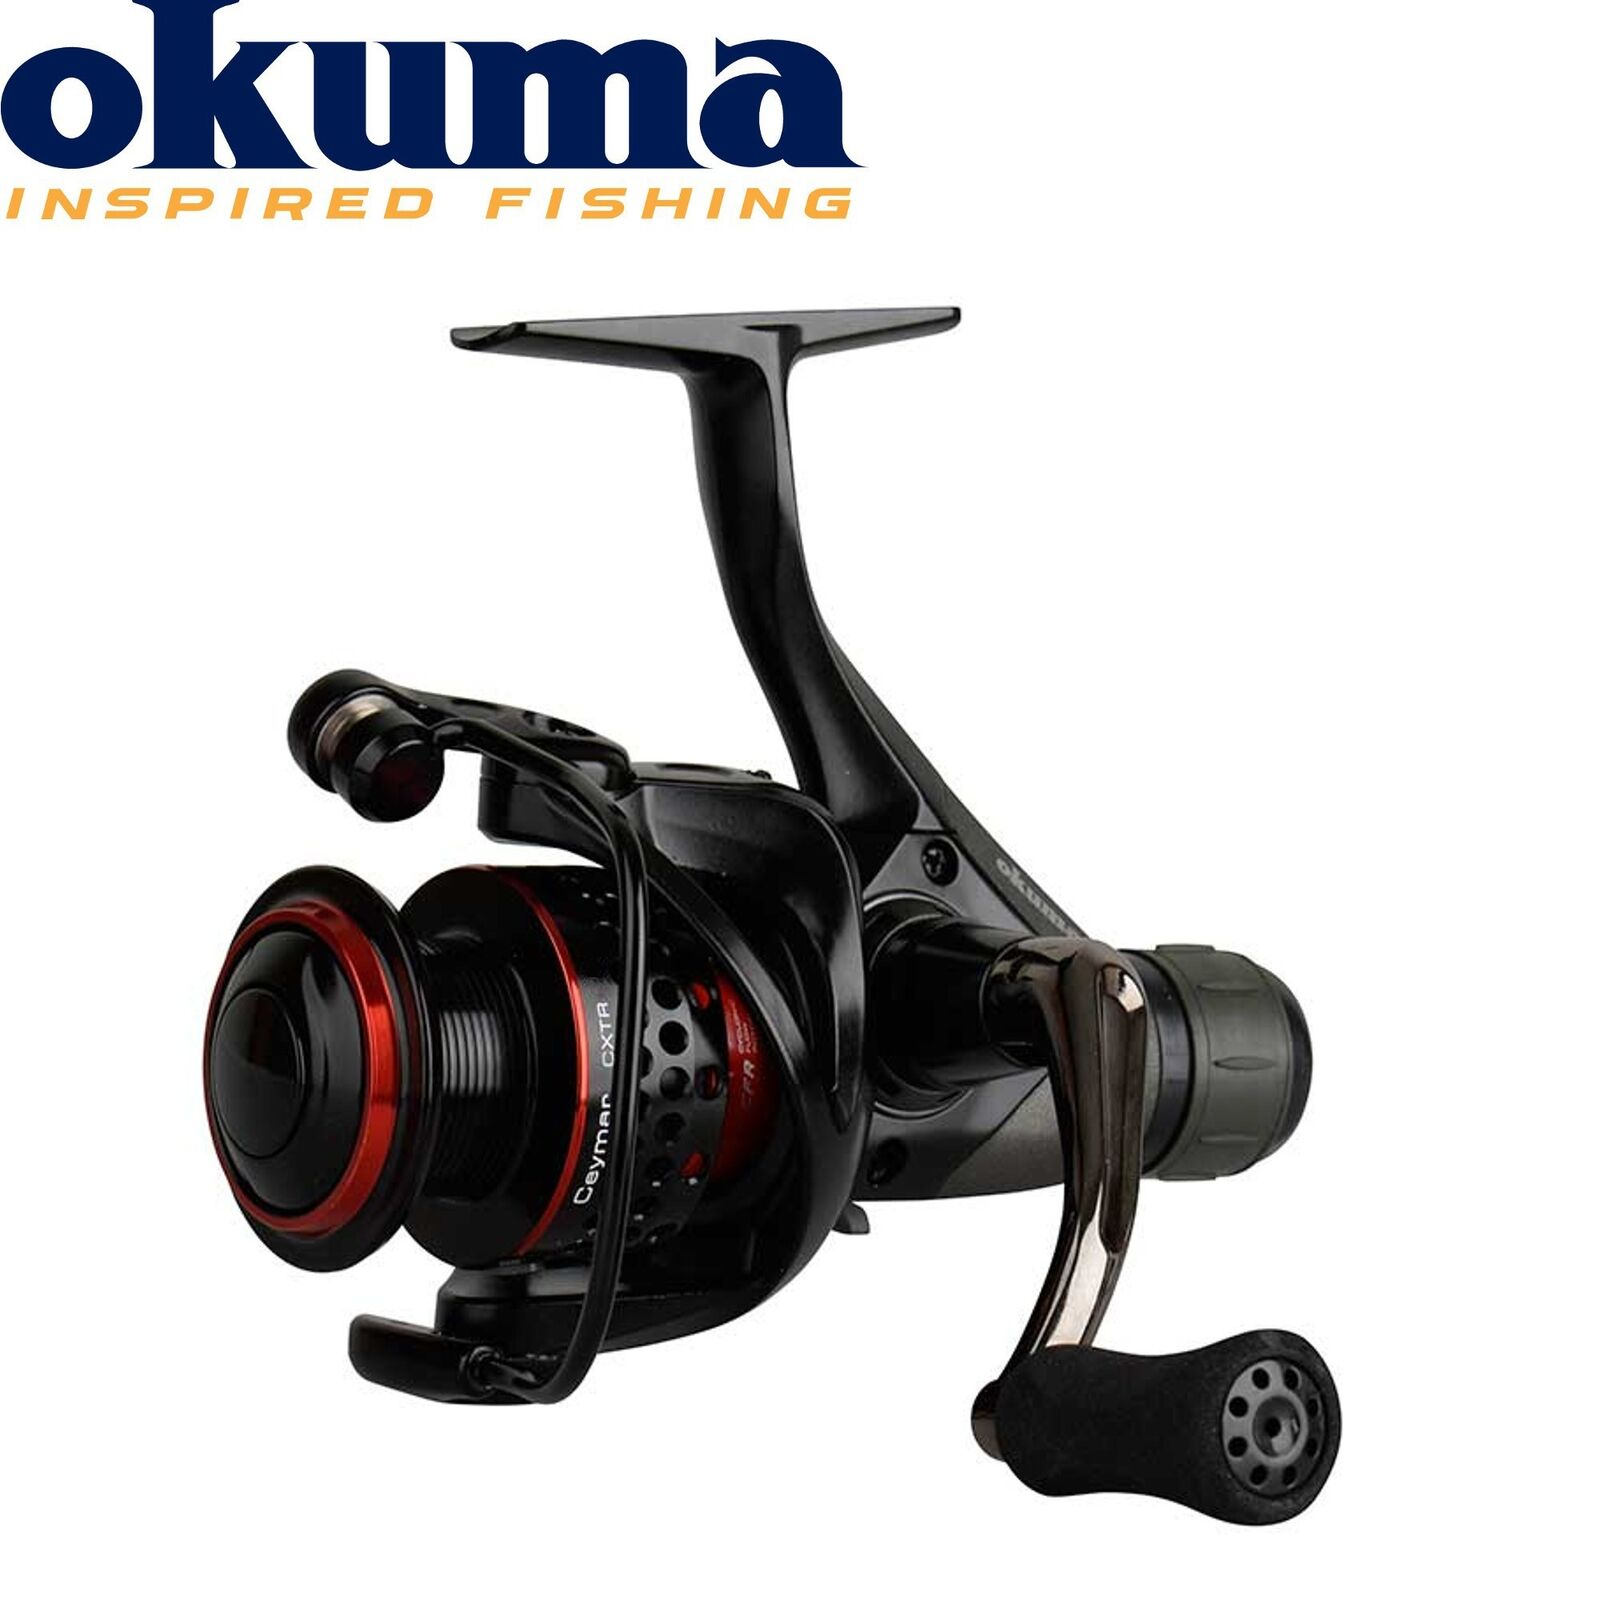 Okuma Futterkorbmontagen Ceymar XT Feeder CXTR-40 - Stationärrolle für Futterkorbmontagen Okuma e9e7cb